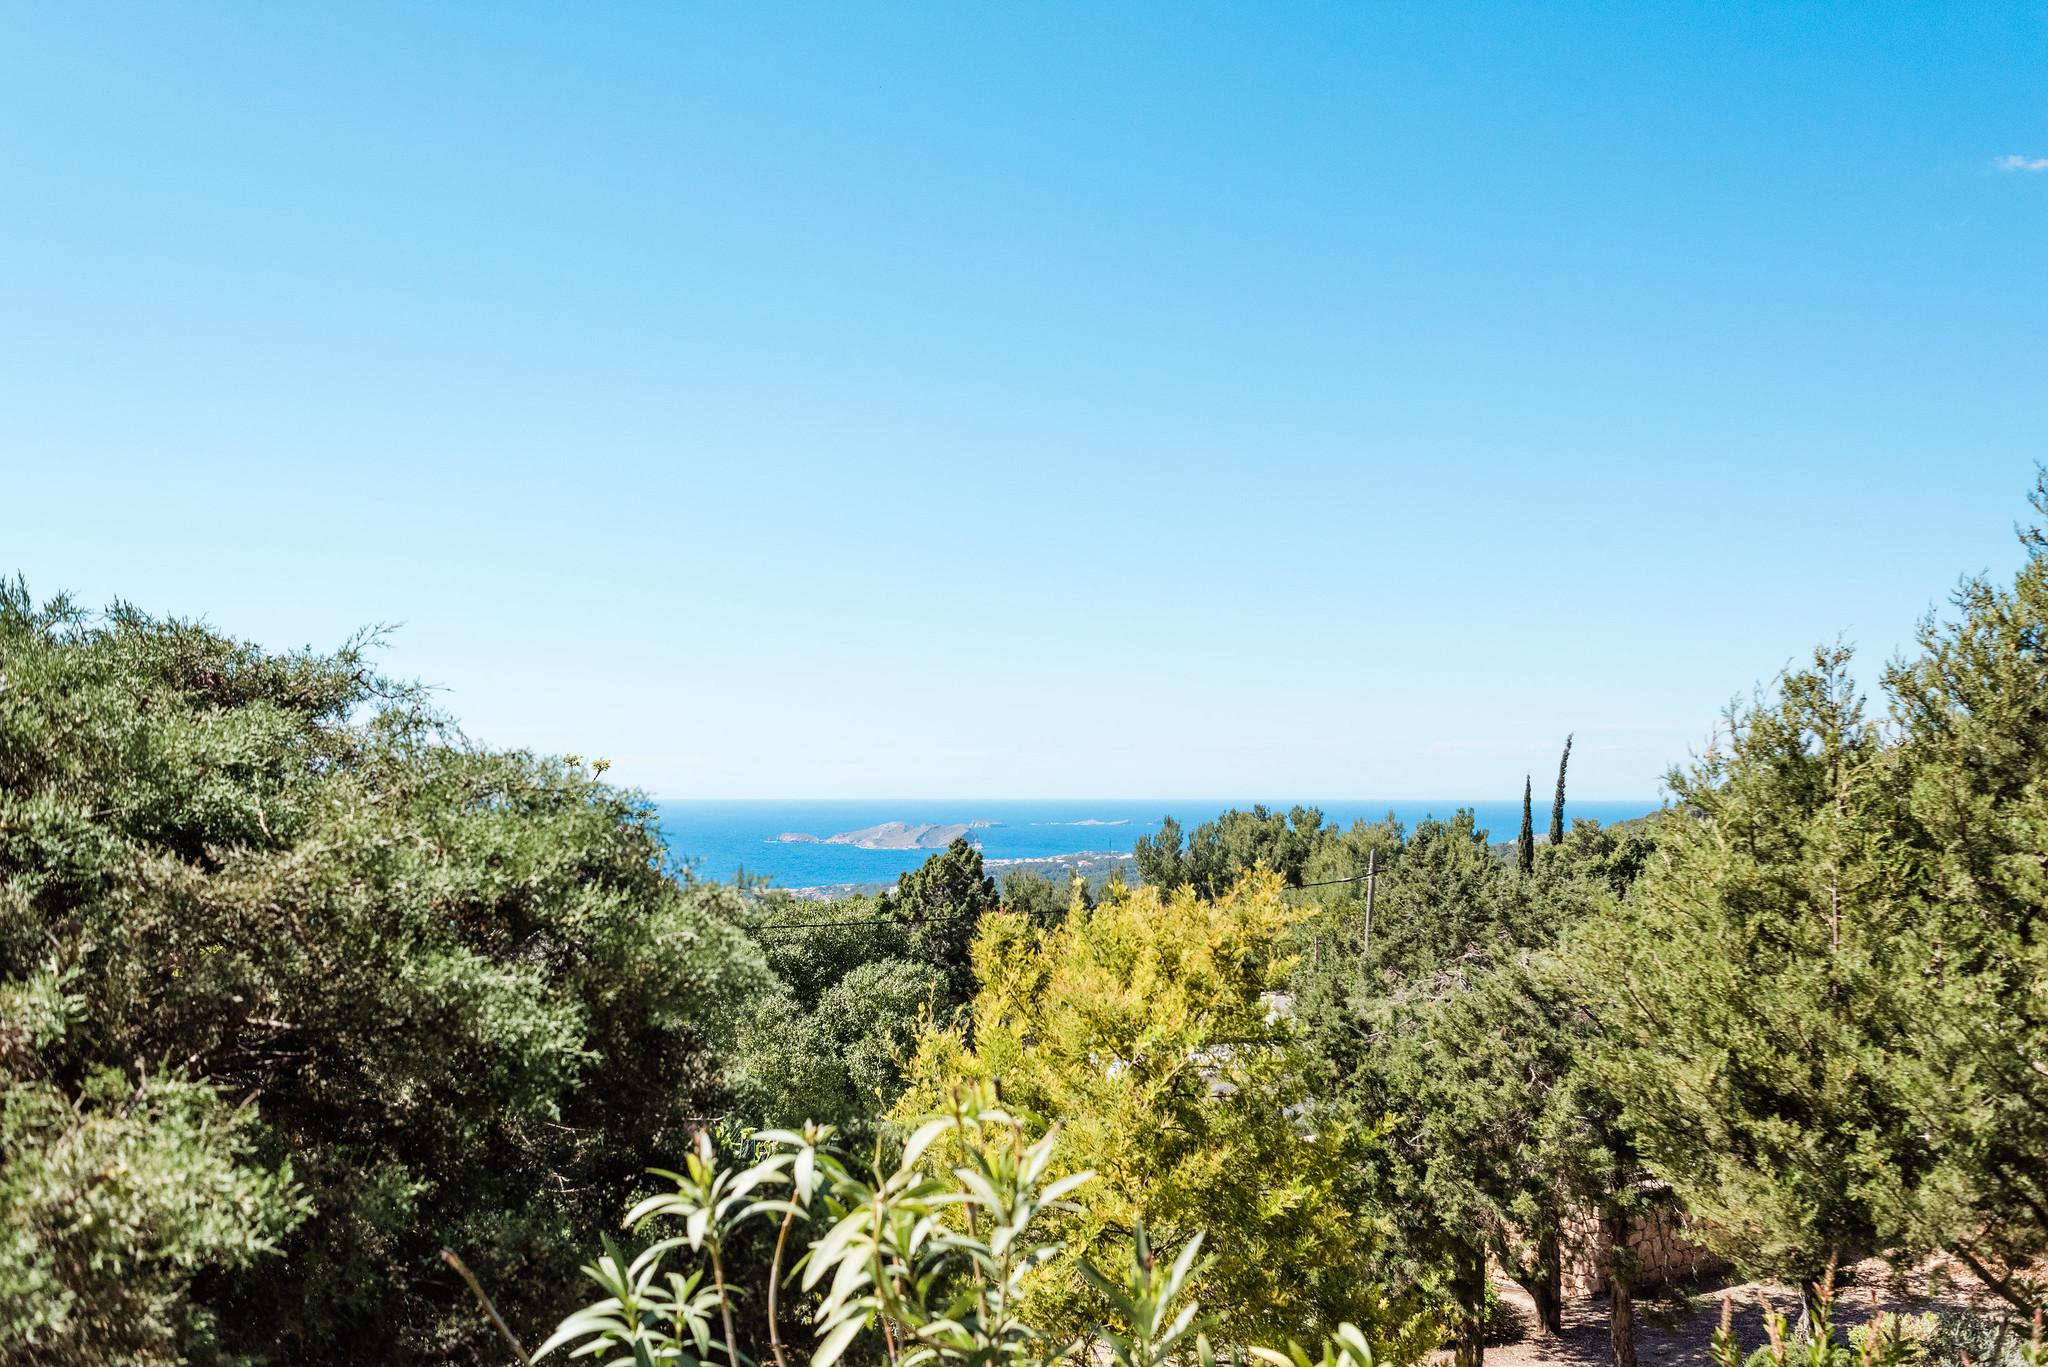 https://www.white-ibiza.com/wp-content/uploads/2020/06/white-ibiza-villas-casa-nyah-exterior-view-over-trees.jpg